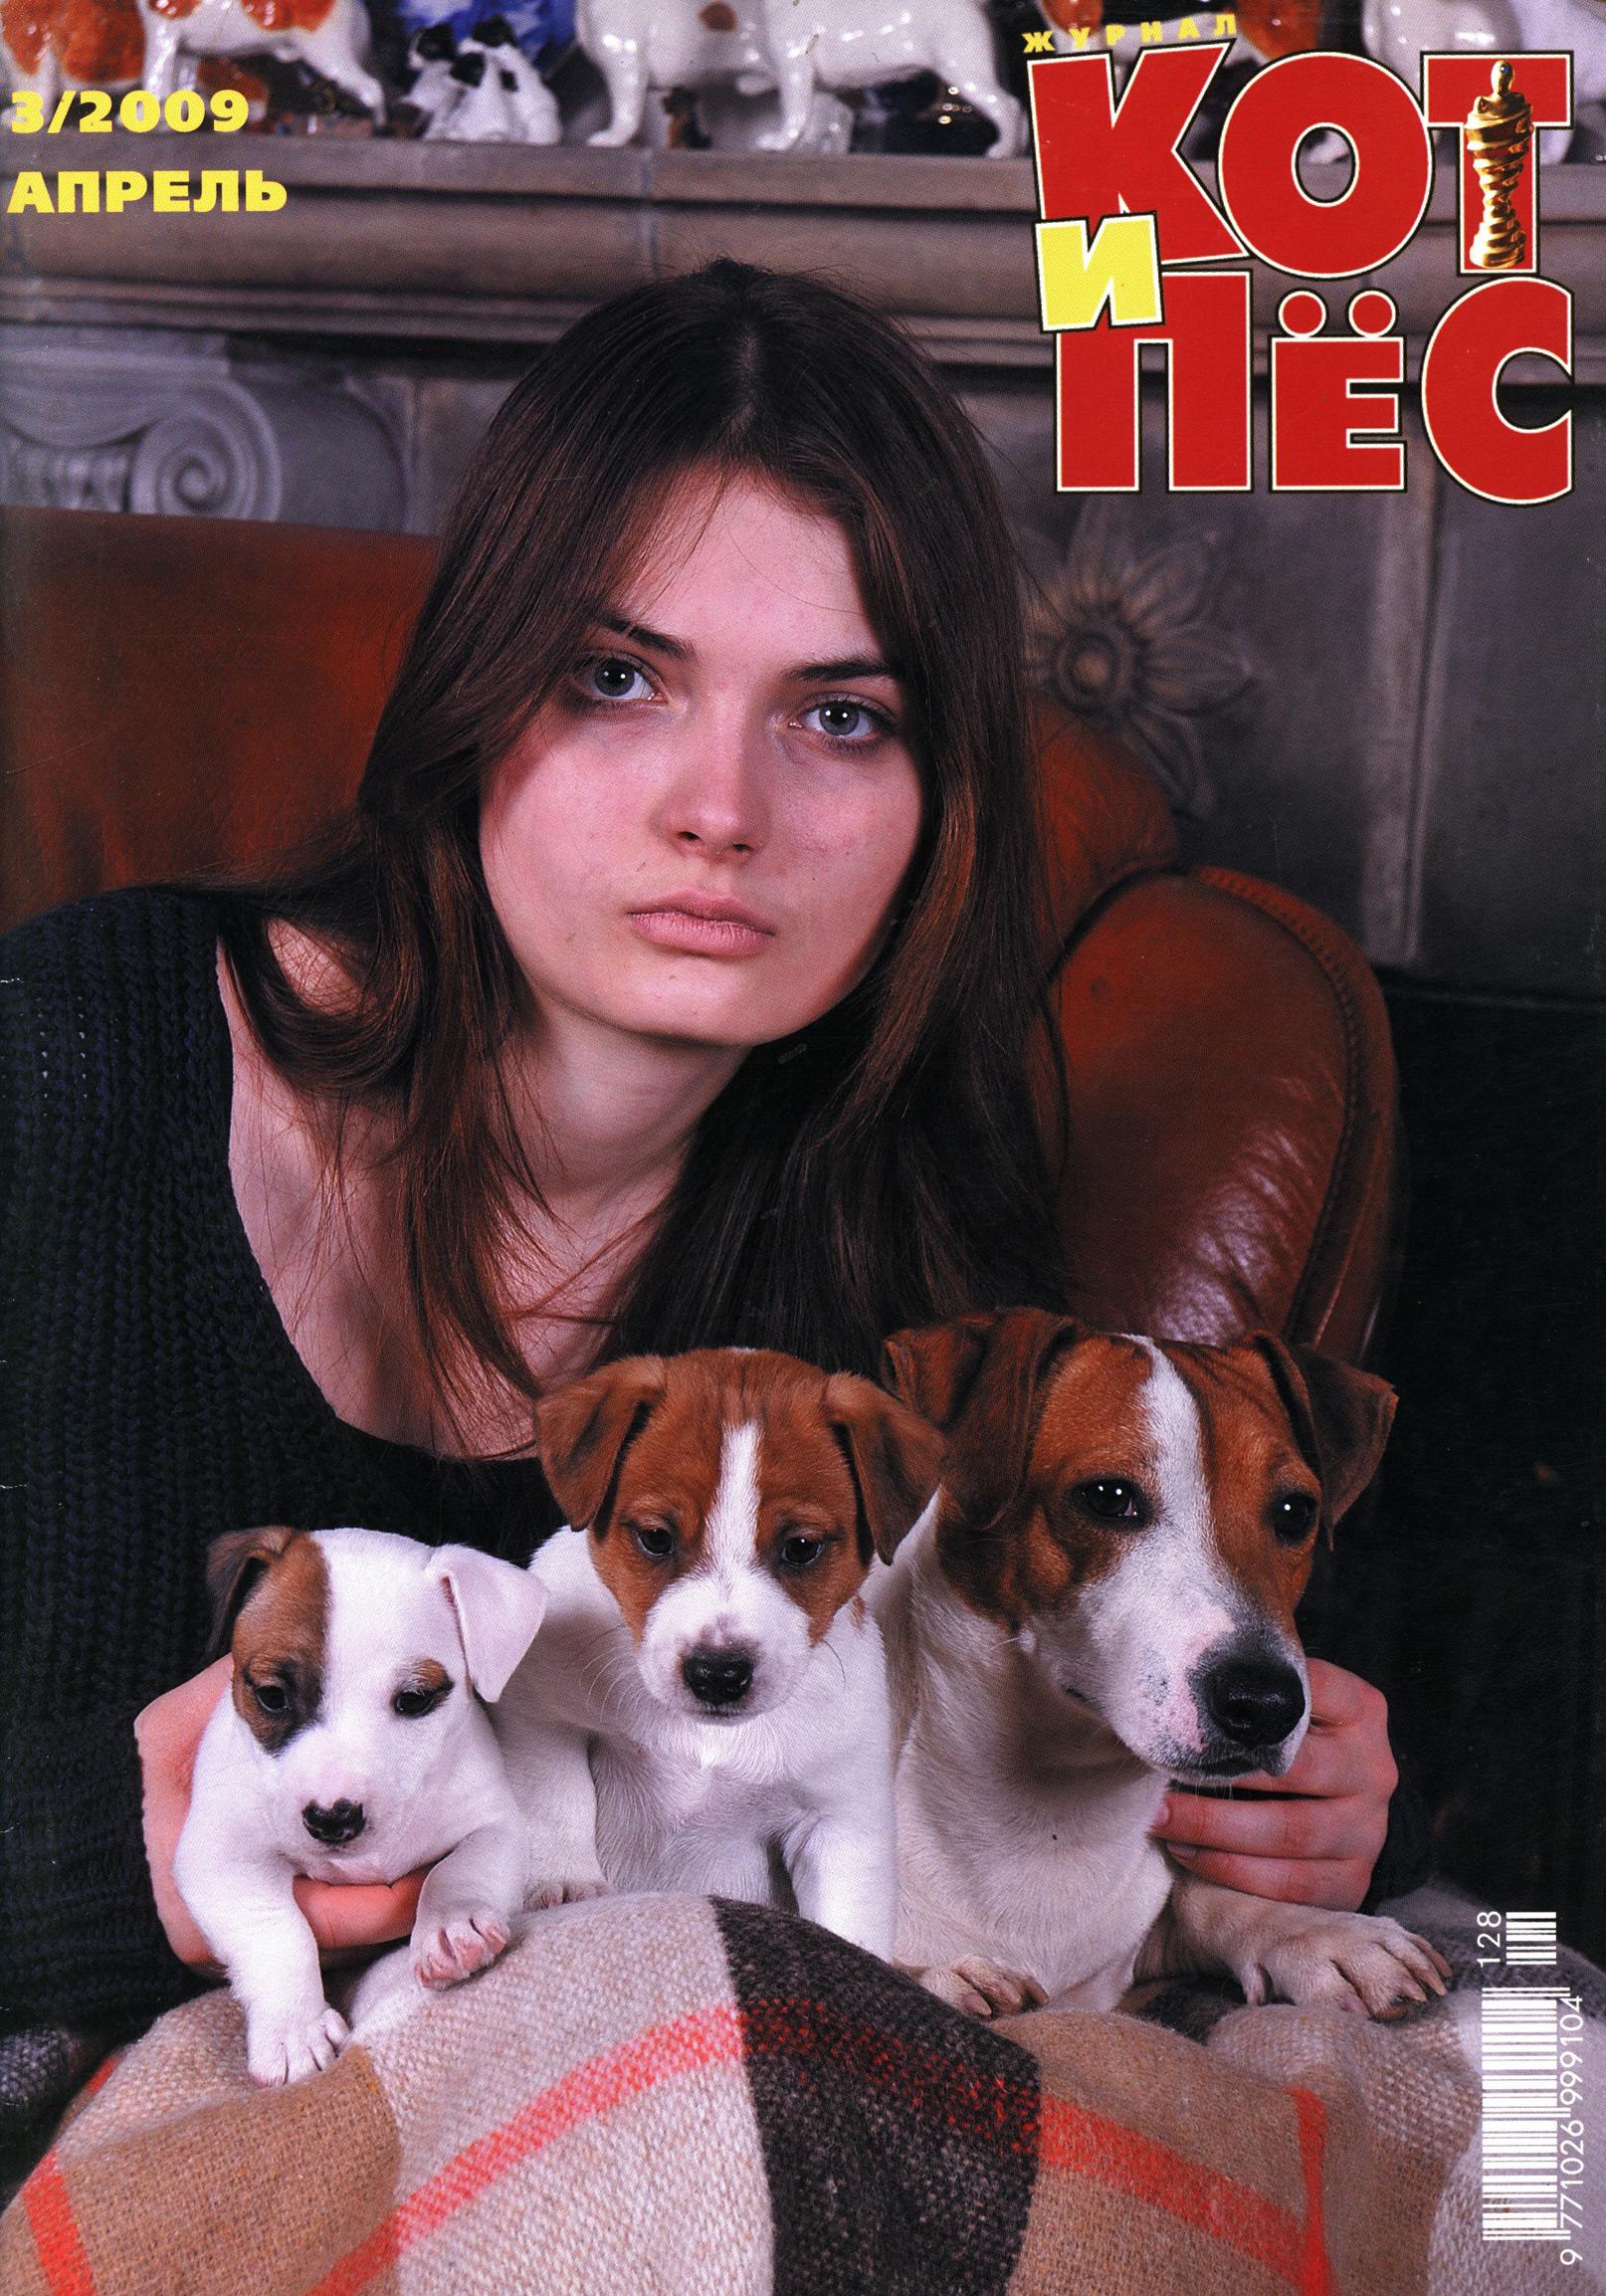 Кот и Пёс №3/2009